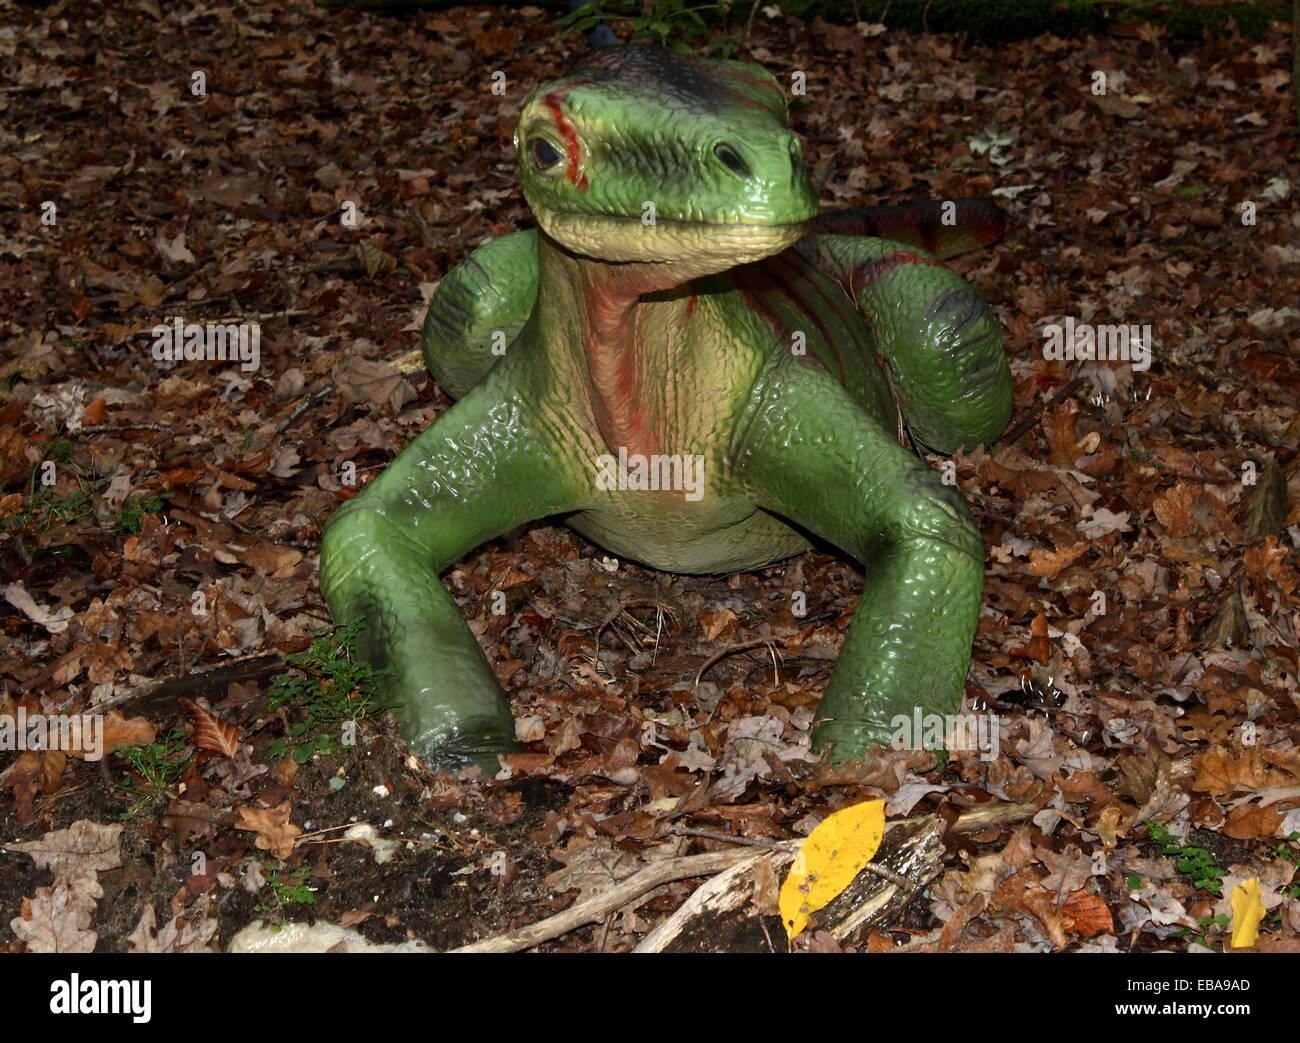 Early Protorosaurus dinosaur, Permian era Over 30 species of lifelike dino statues at  Dinopark Amersfoort Zoo, - Stock Image